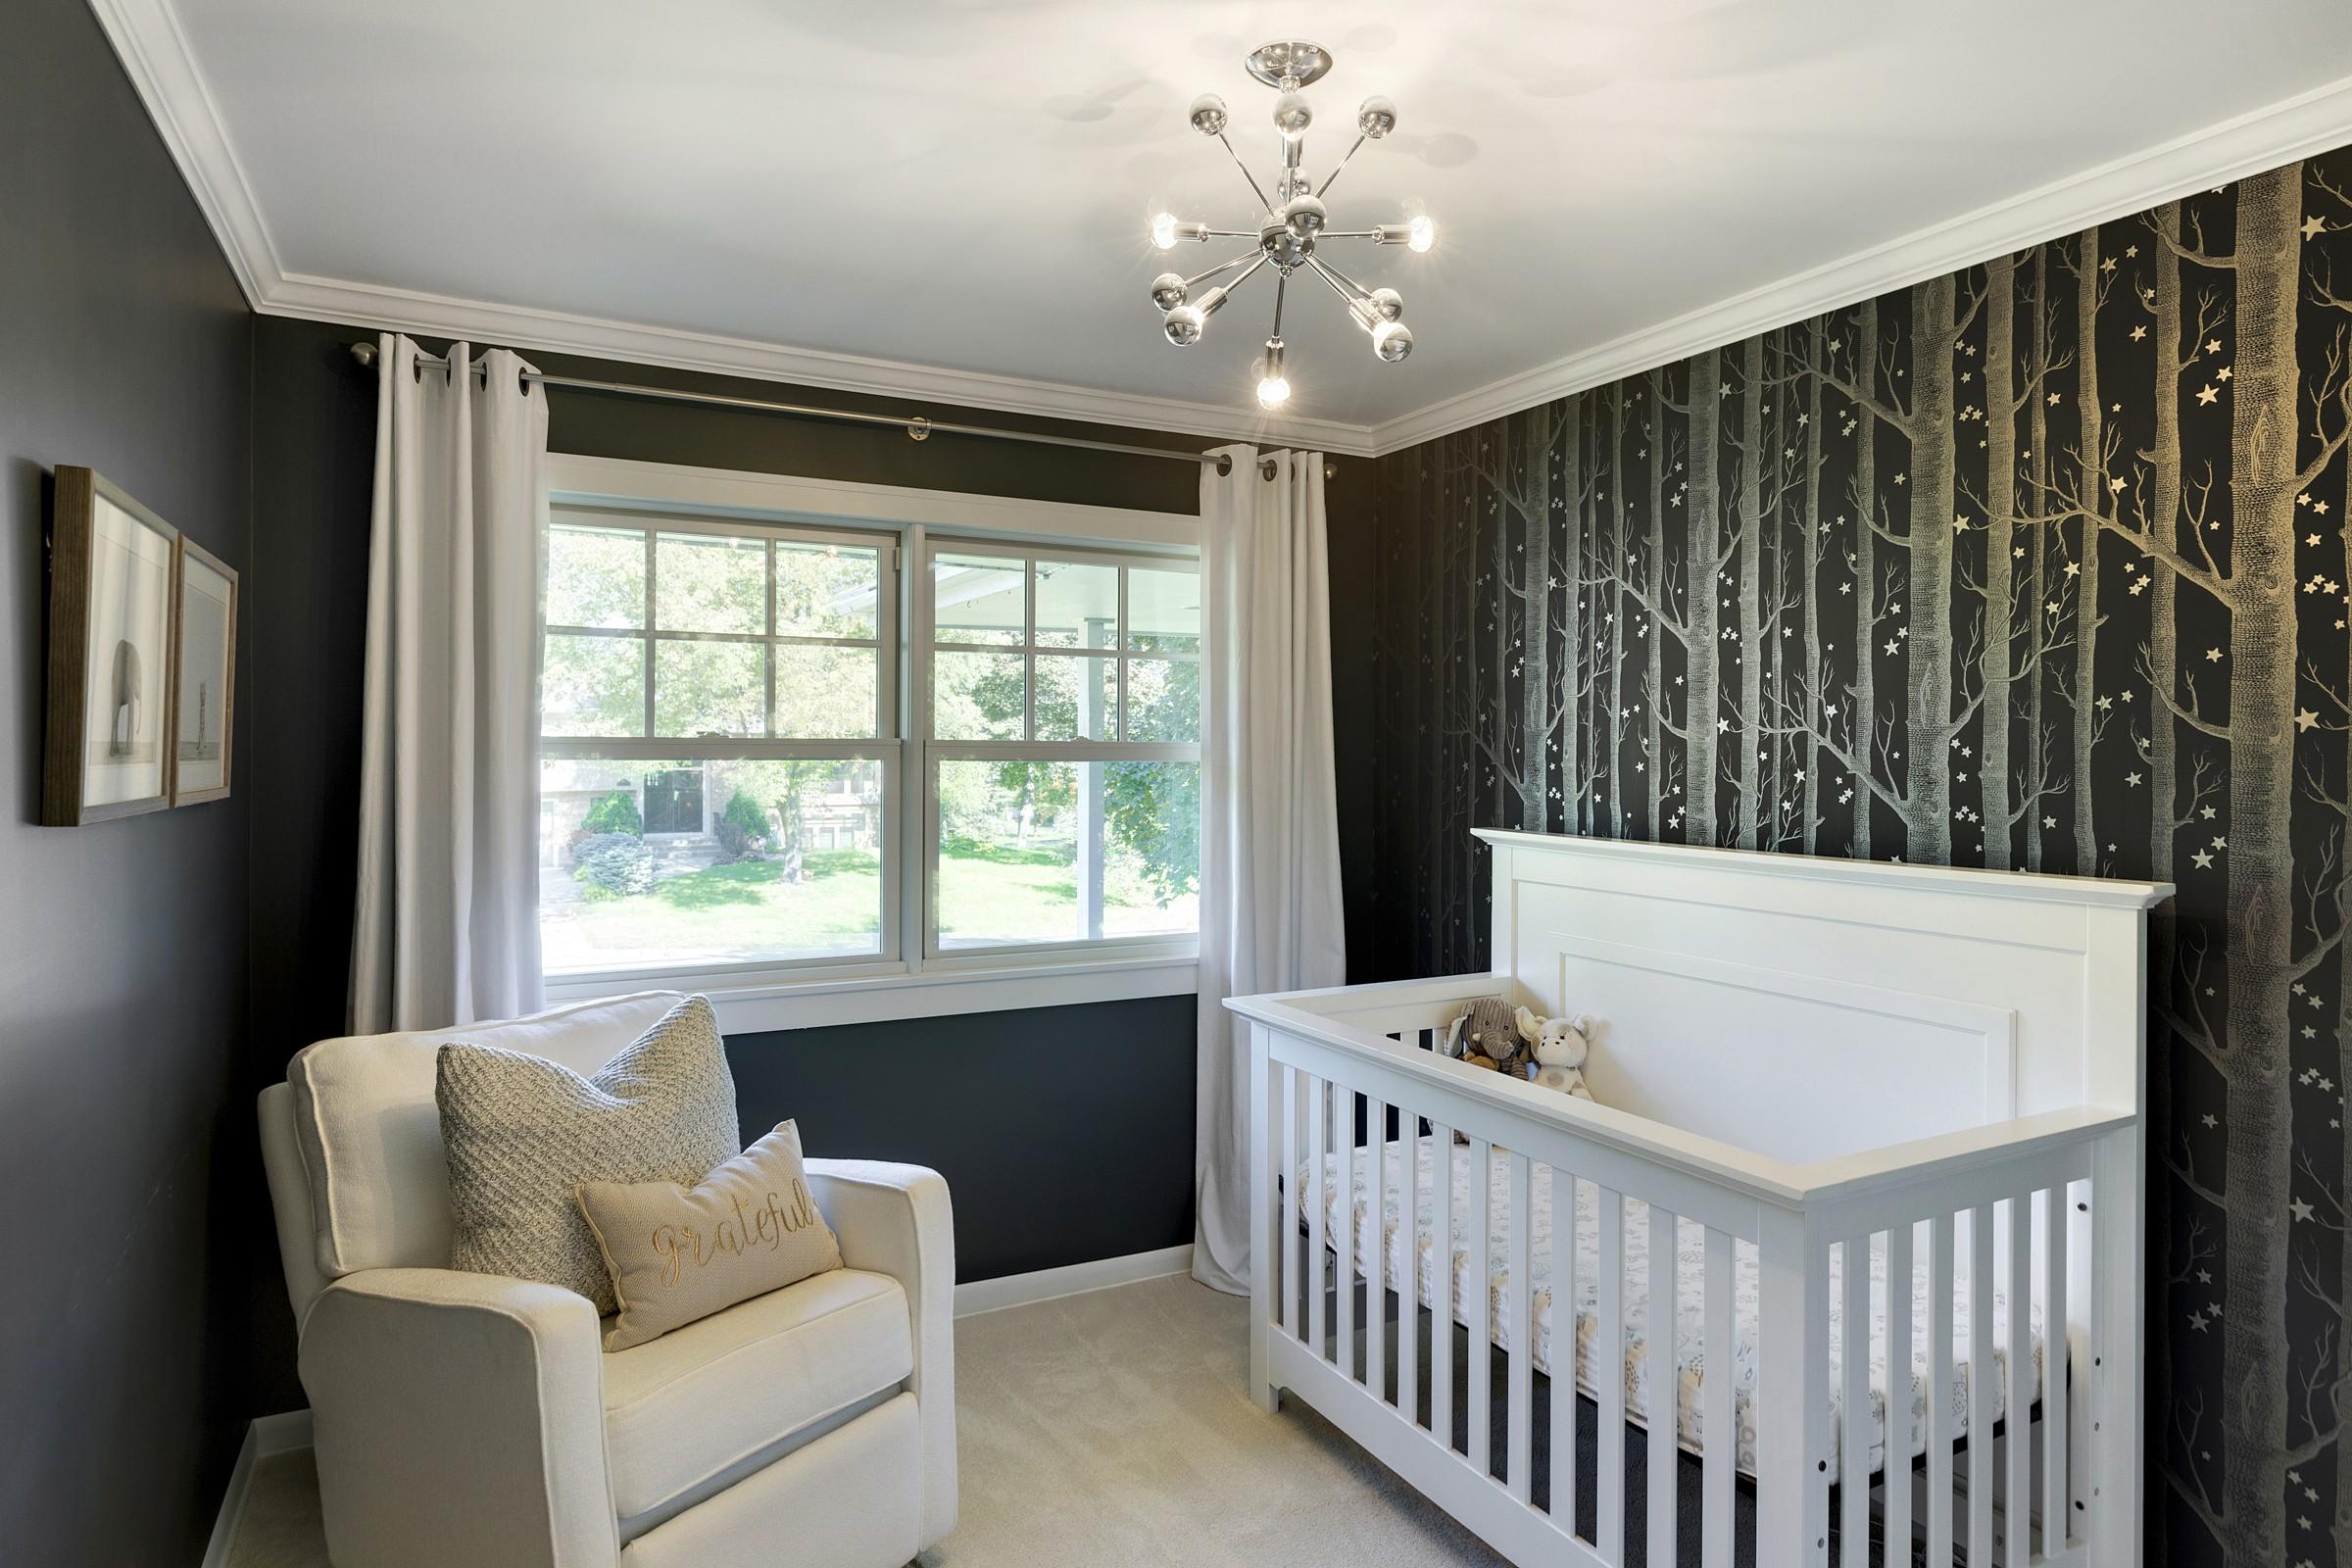 Nursery Design -